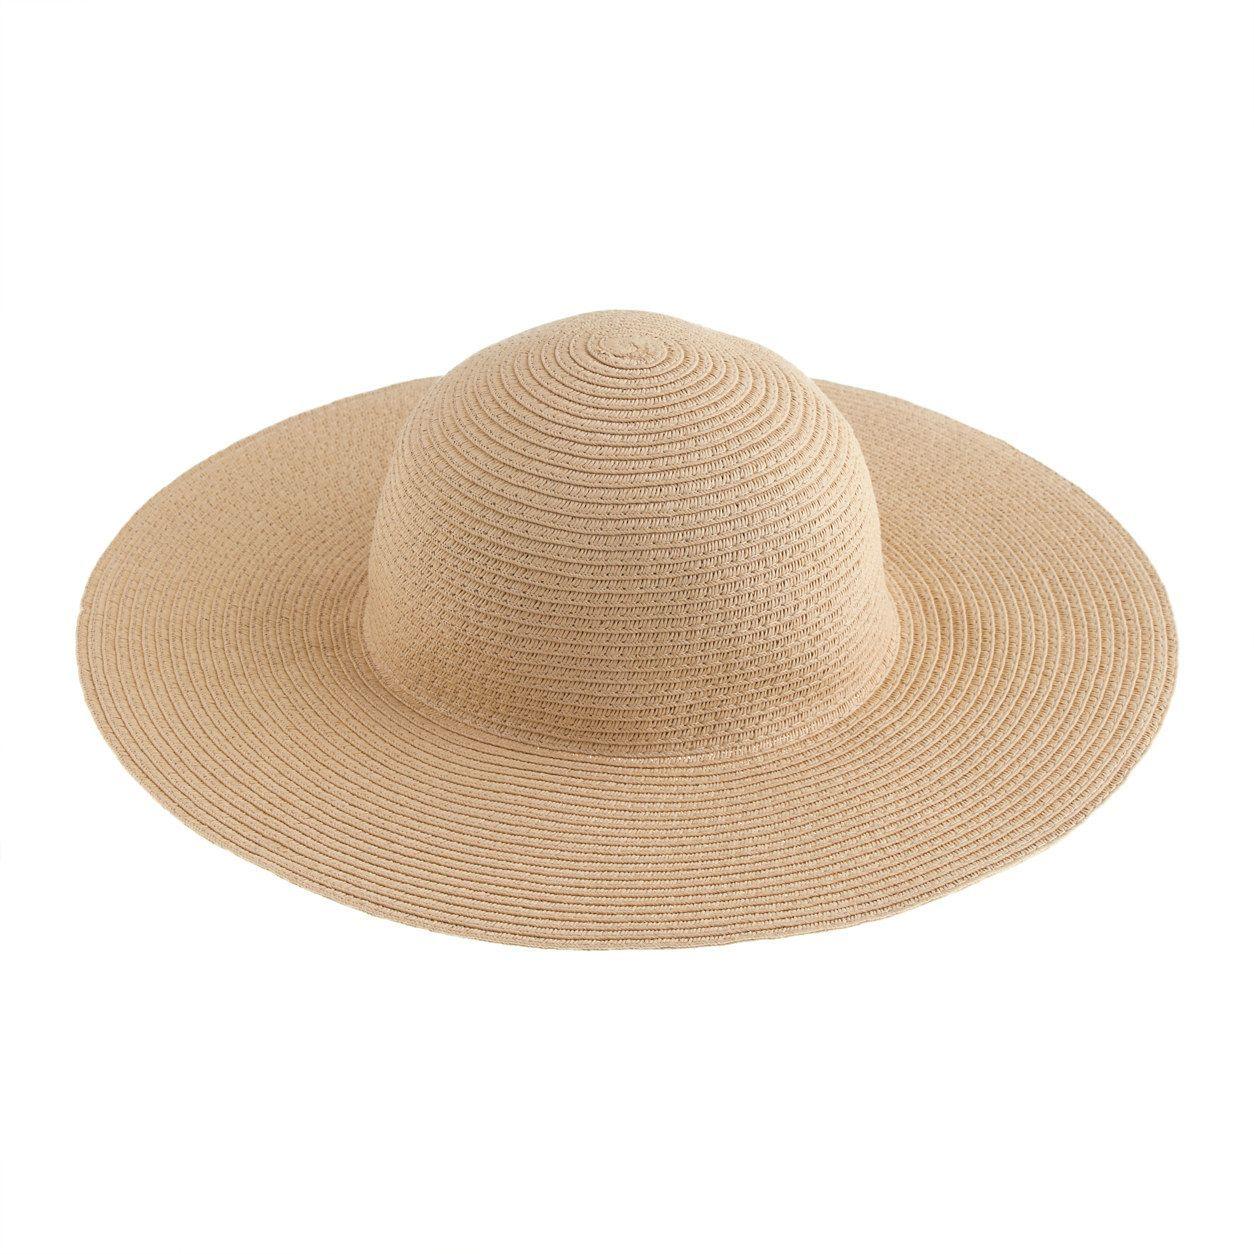 crewcuts Girls Floppy Sun Hat (Size L-XL Kid)  de4767d8d98